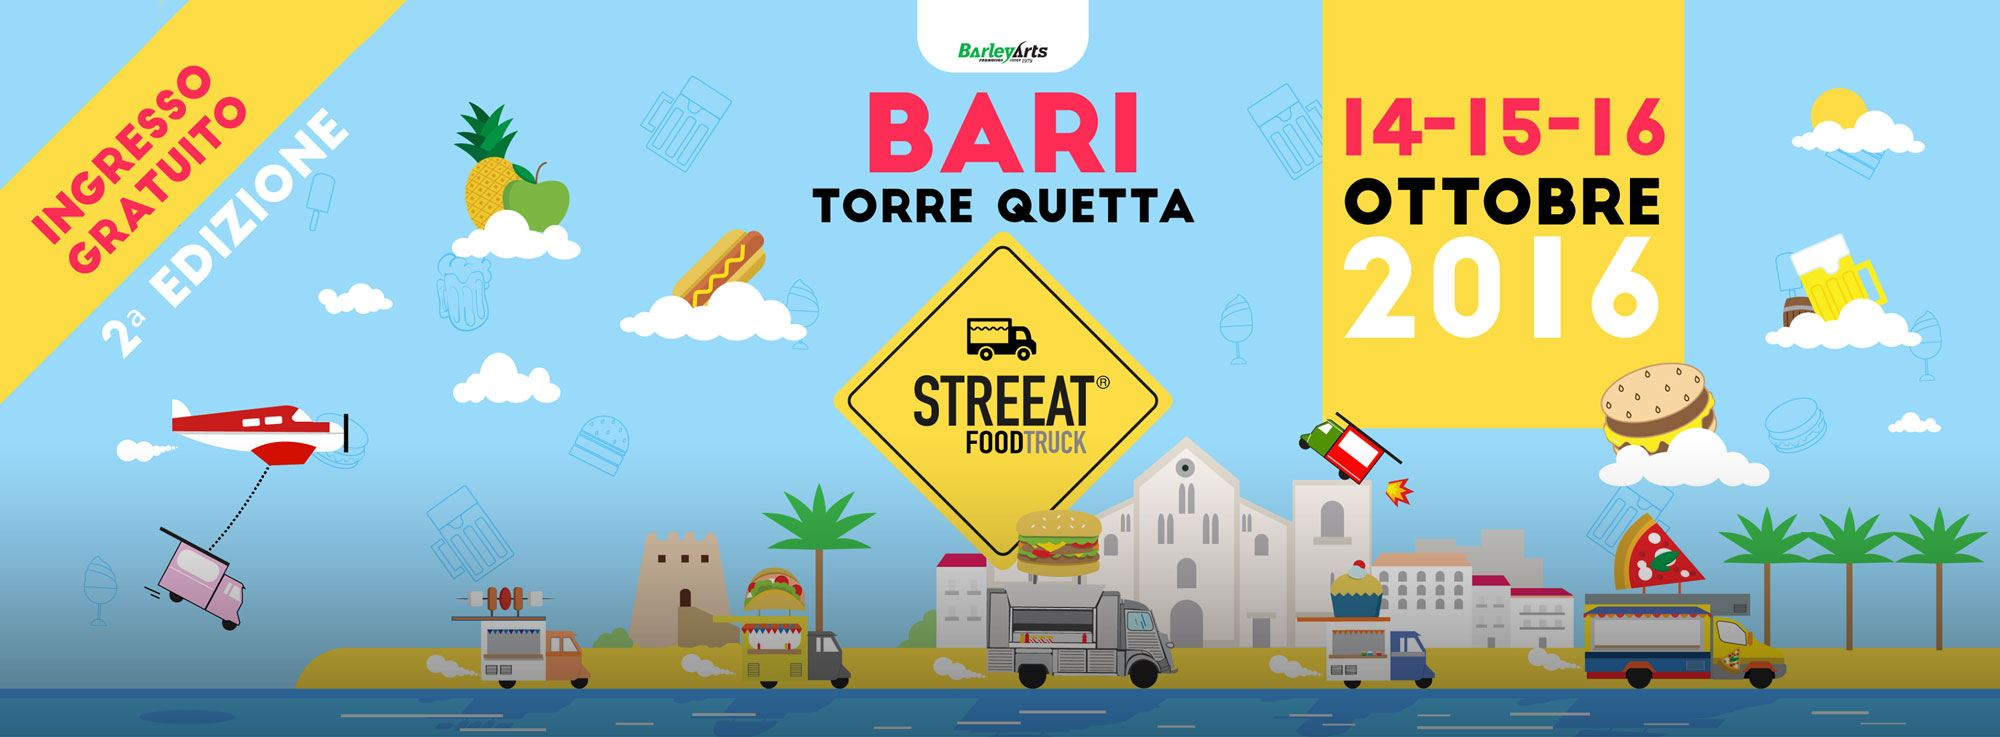 Torre Quetta: StreEAT, European Food Truck Festiva